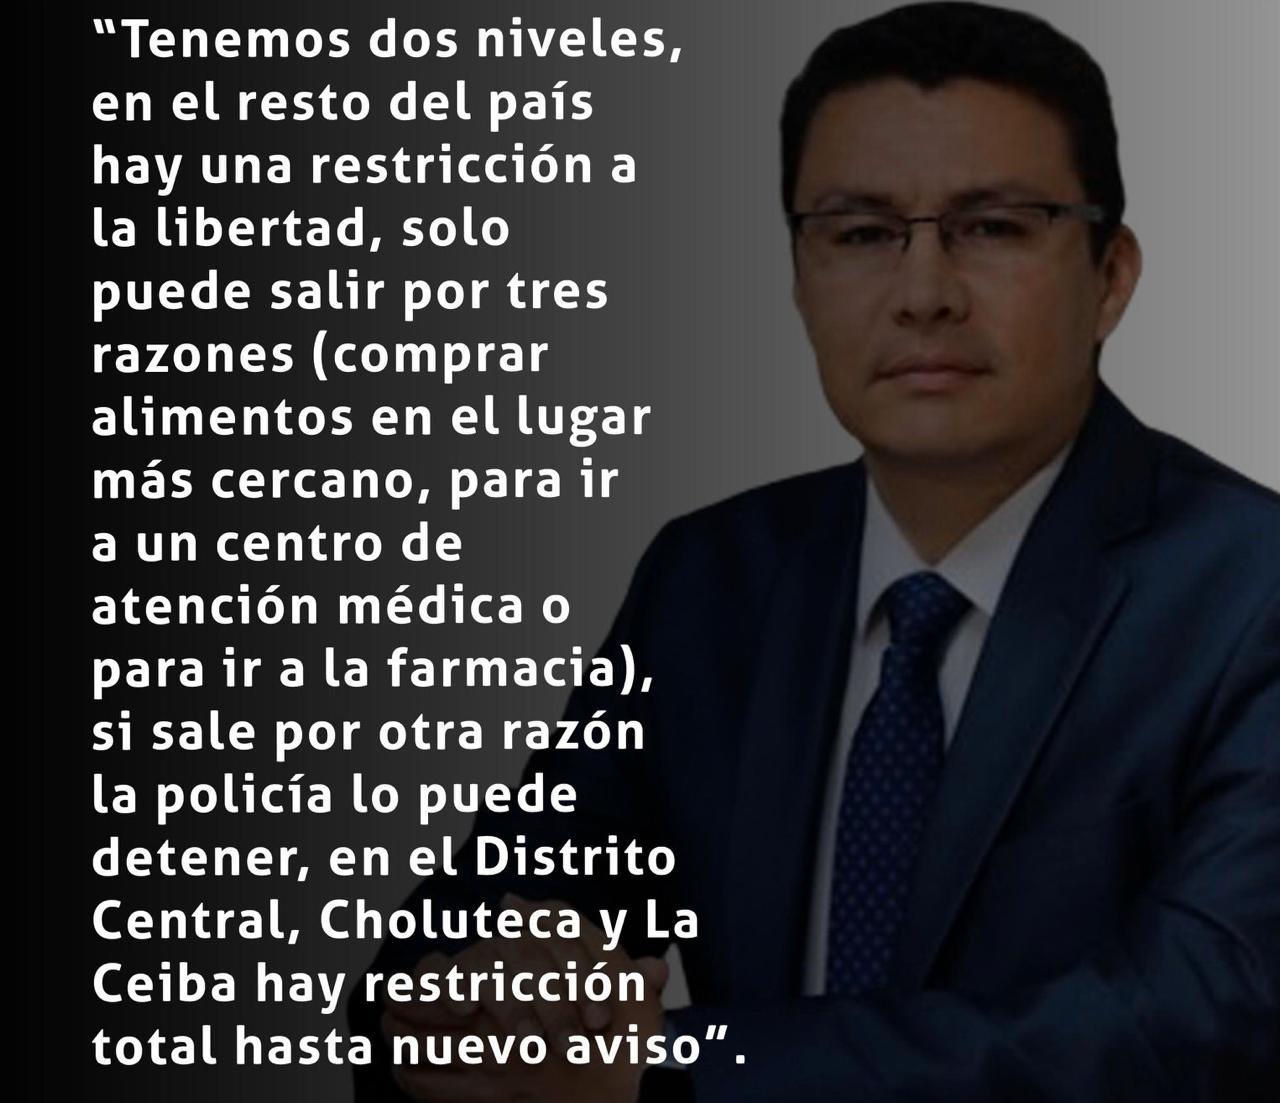 Aclaración de parte de Ministro Ebal Diaz